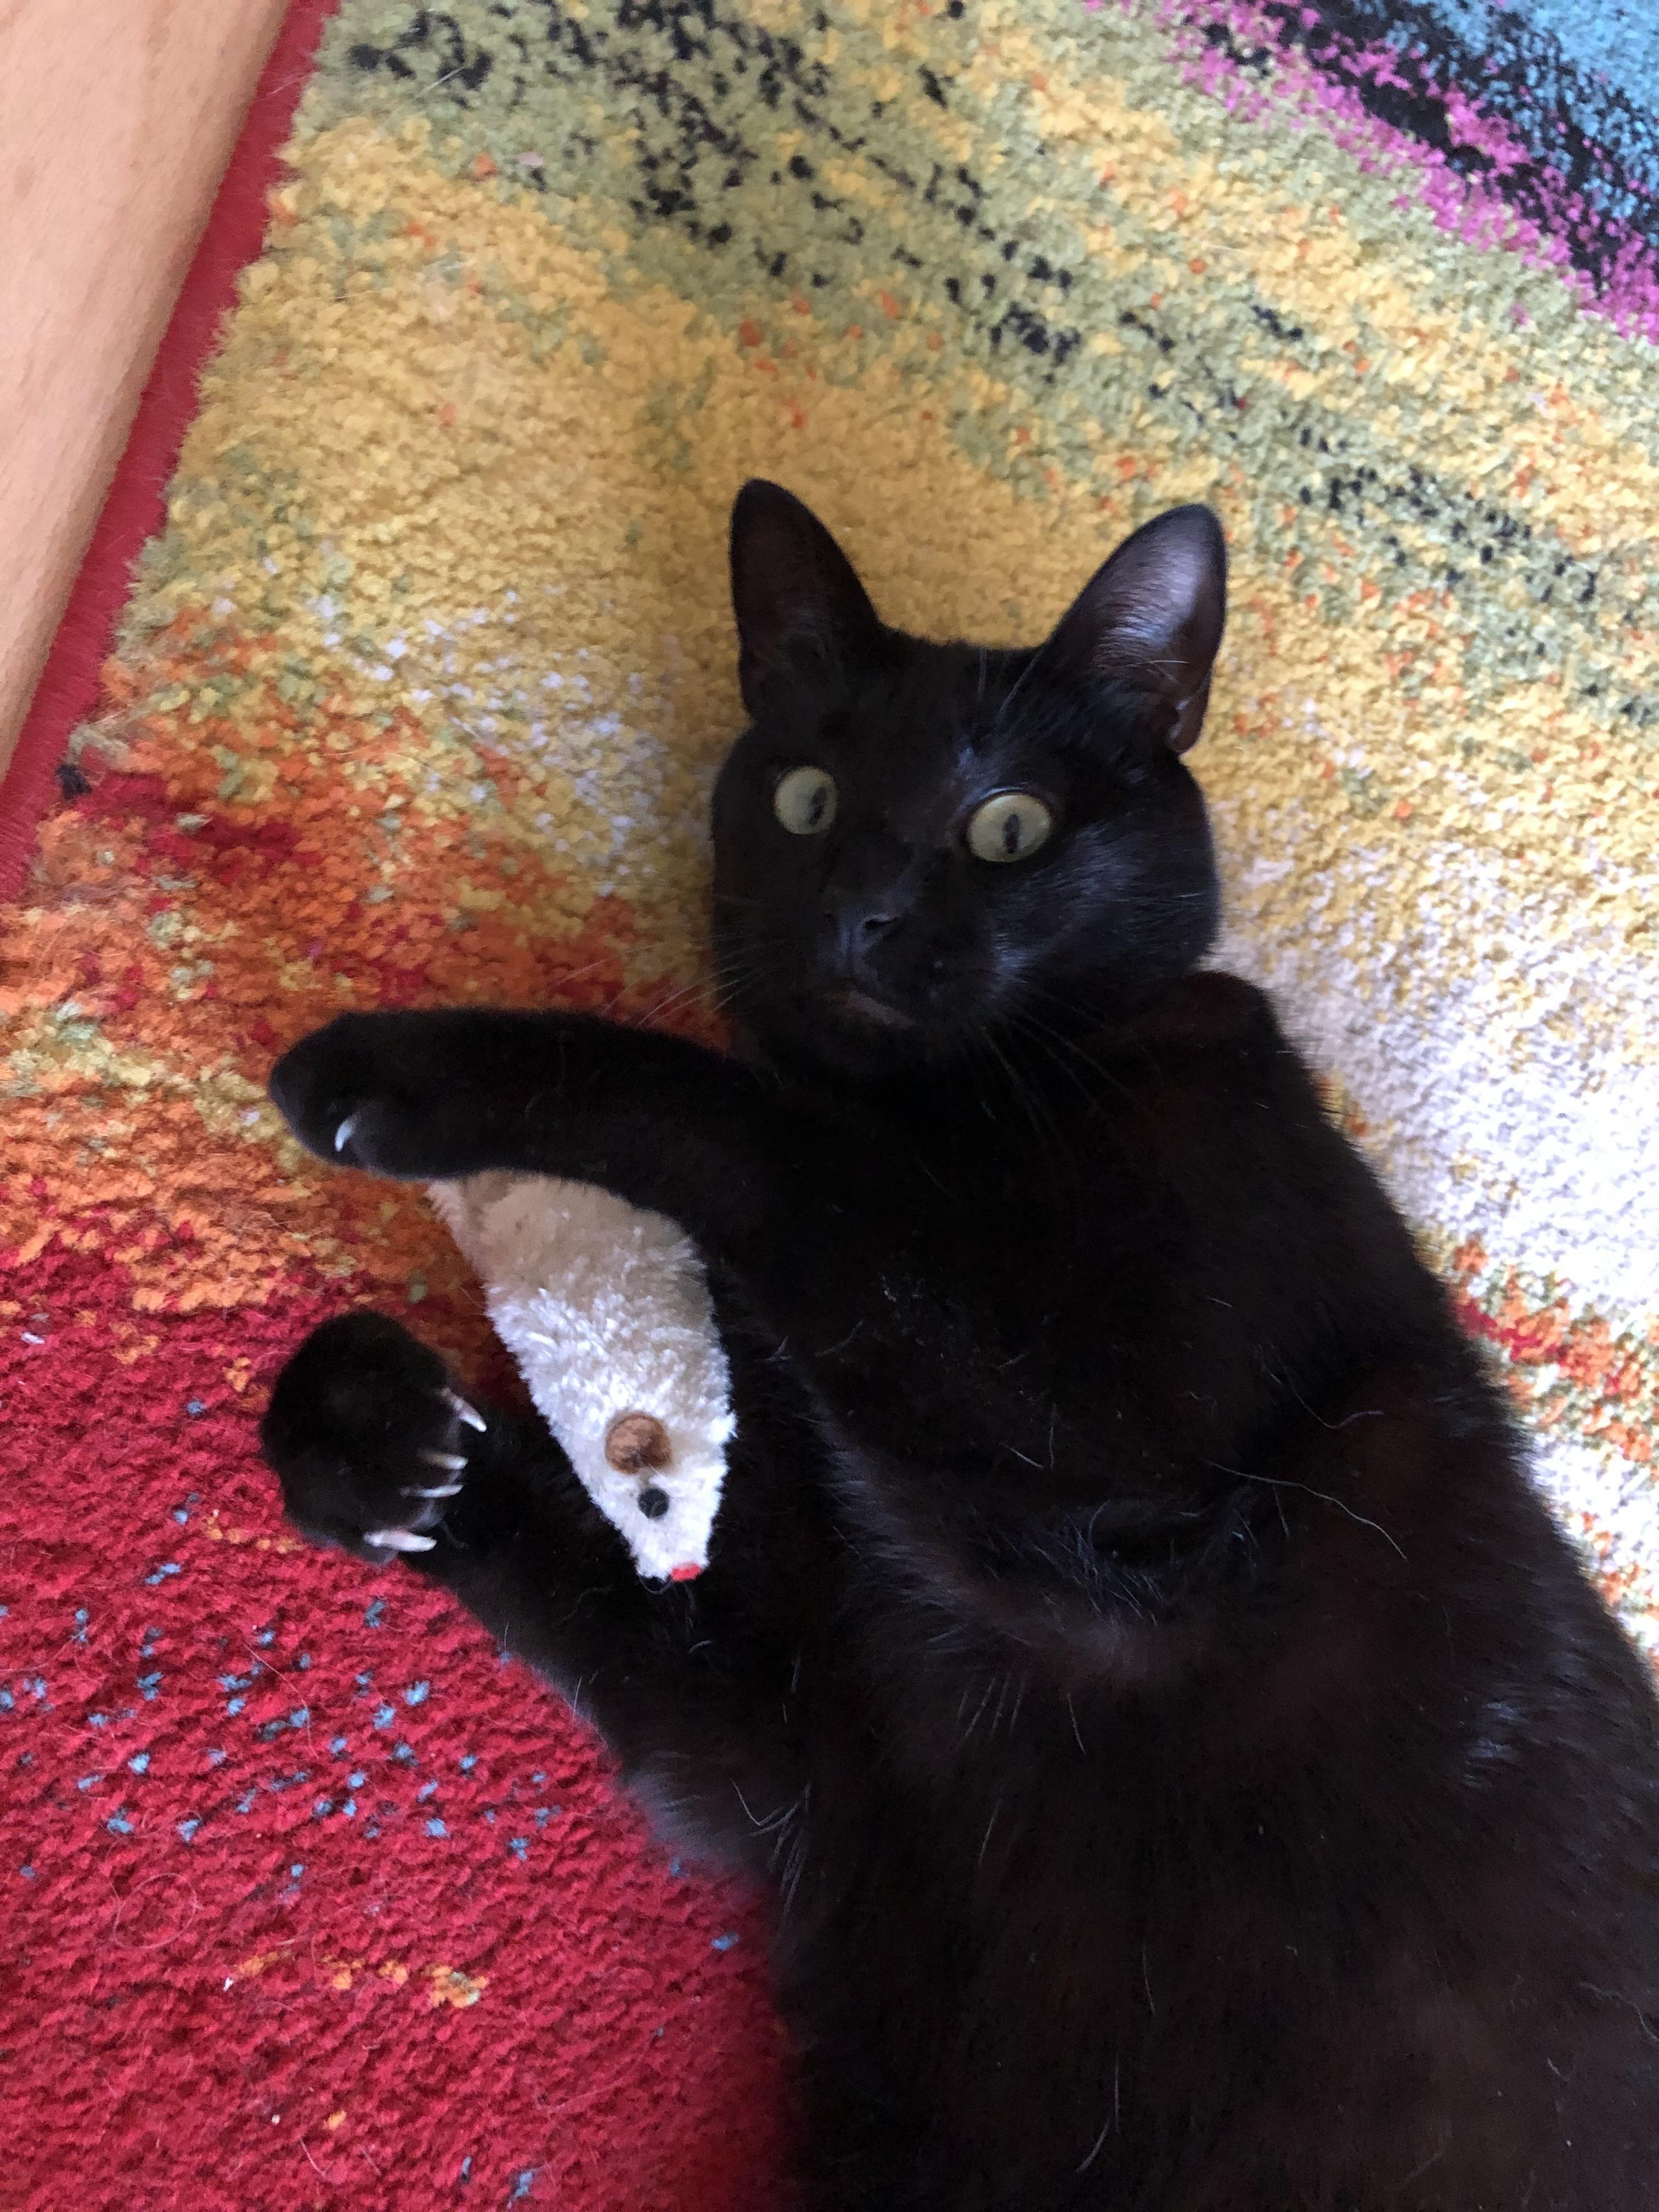 Iris Paula And Her Dangerous Claws Cats Kitty Animals